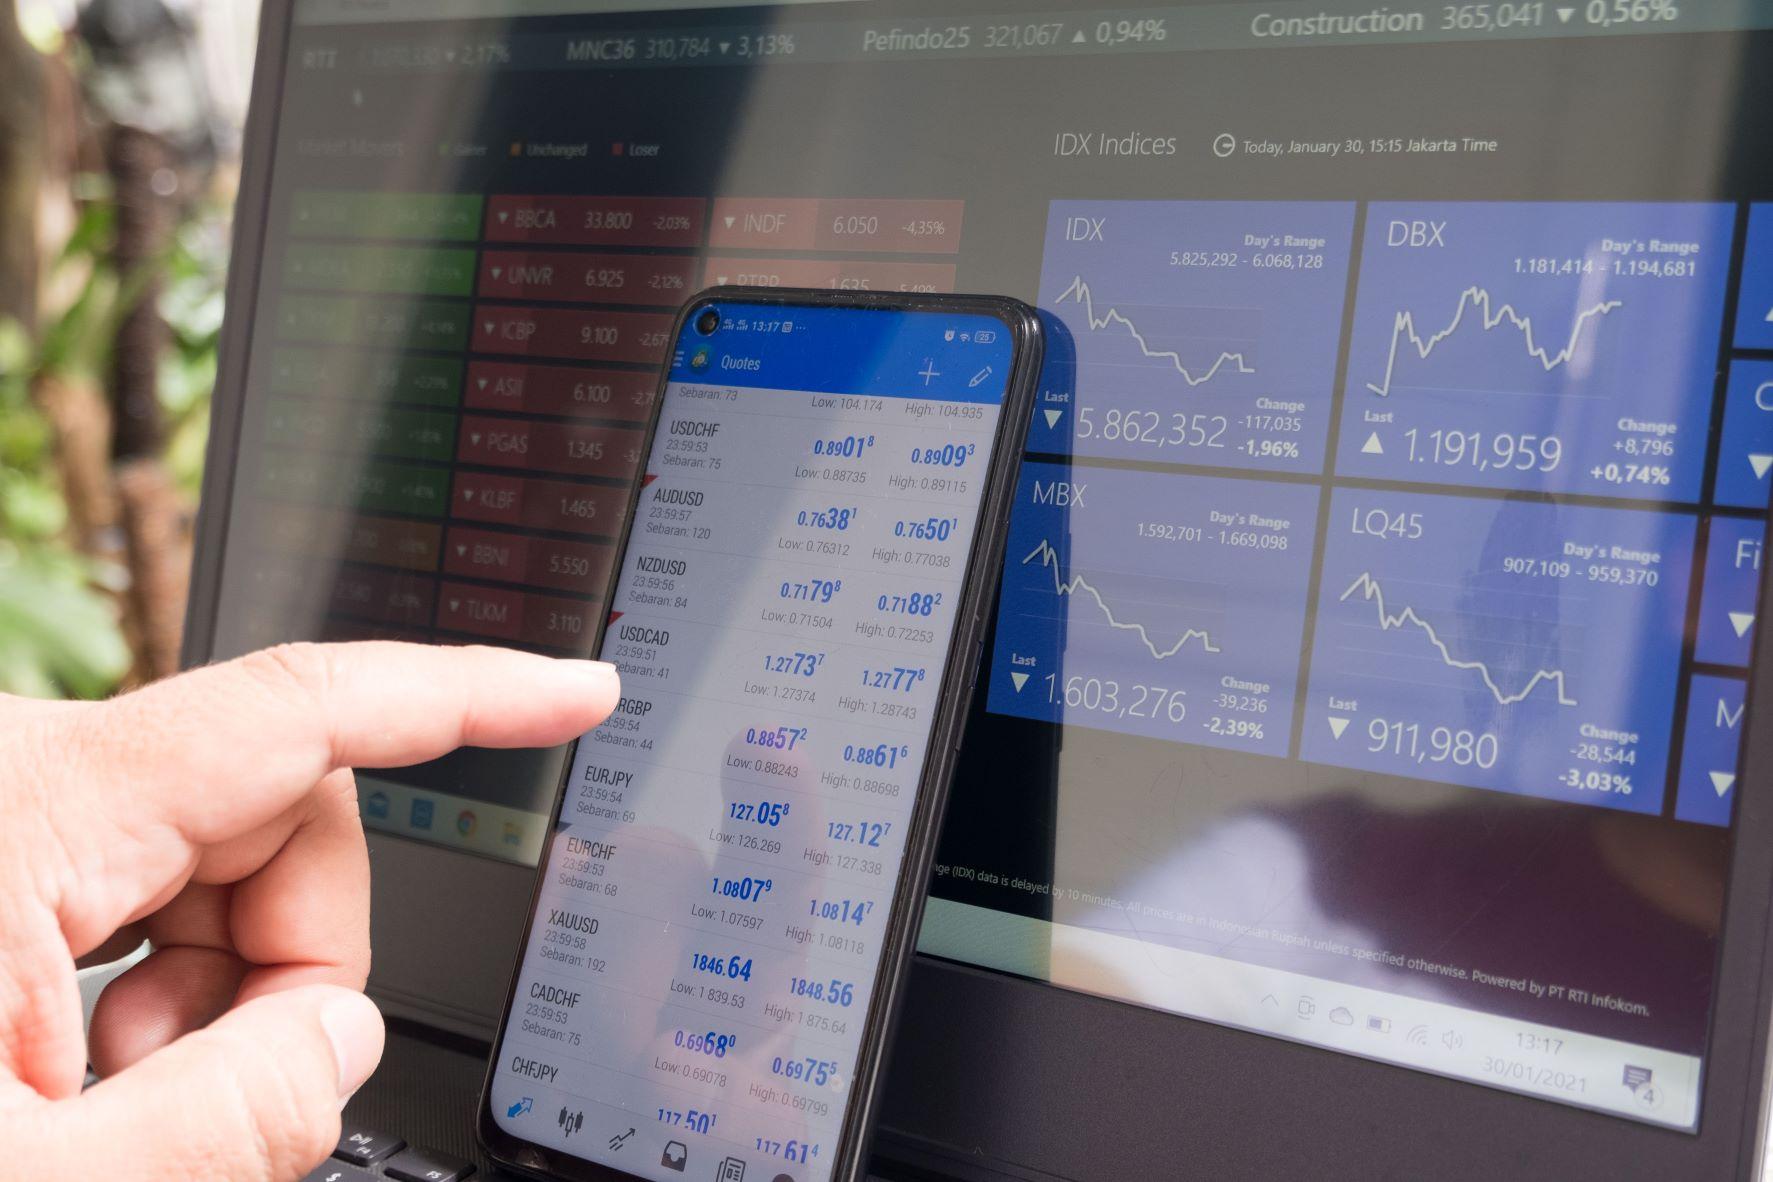 Тест-драйв на финансовых рынках от ЦБТ